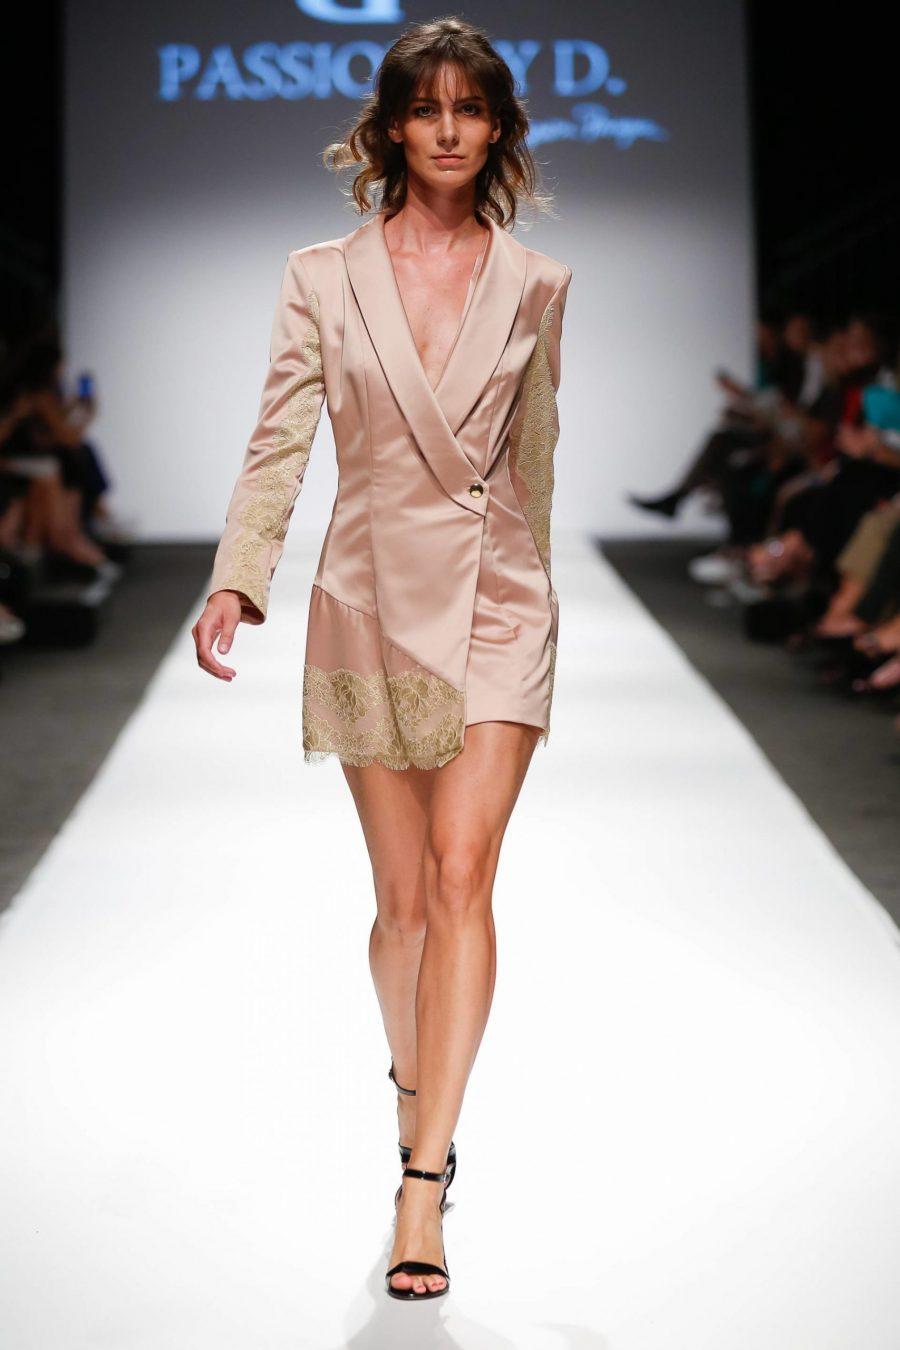 Rochie tip sacou cu dantela Vienna Fashion week 2019 - Passion by D